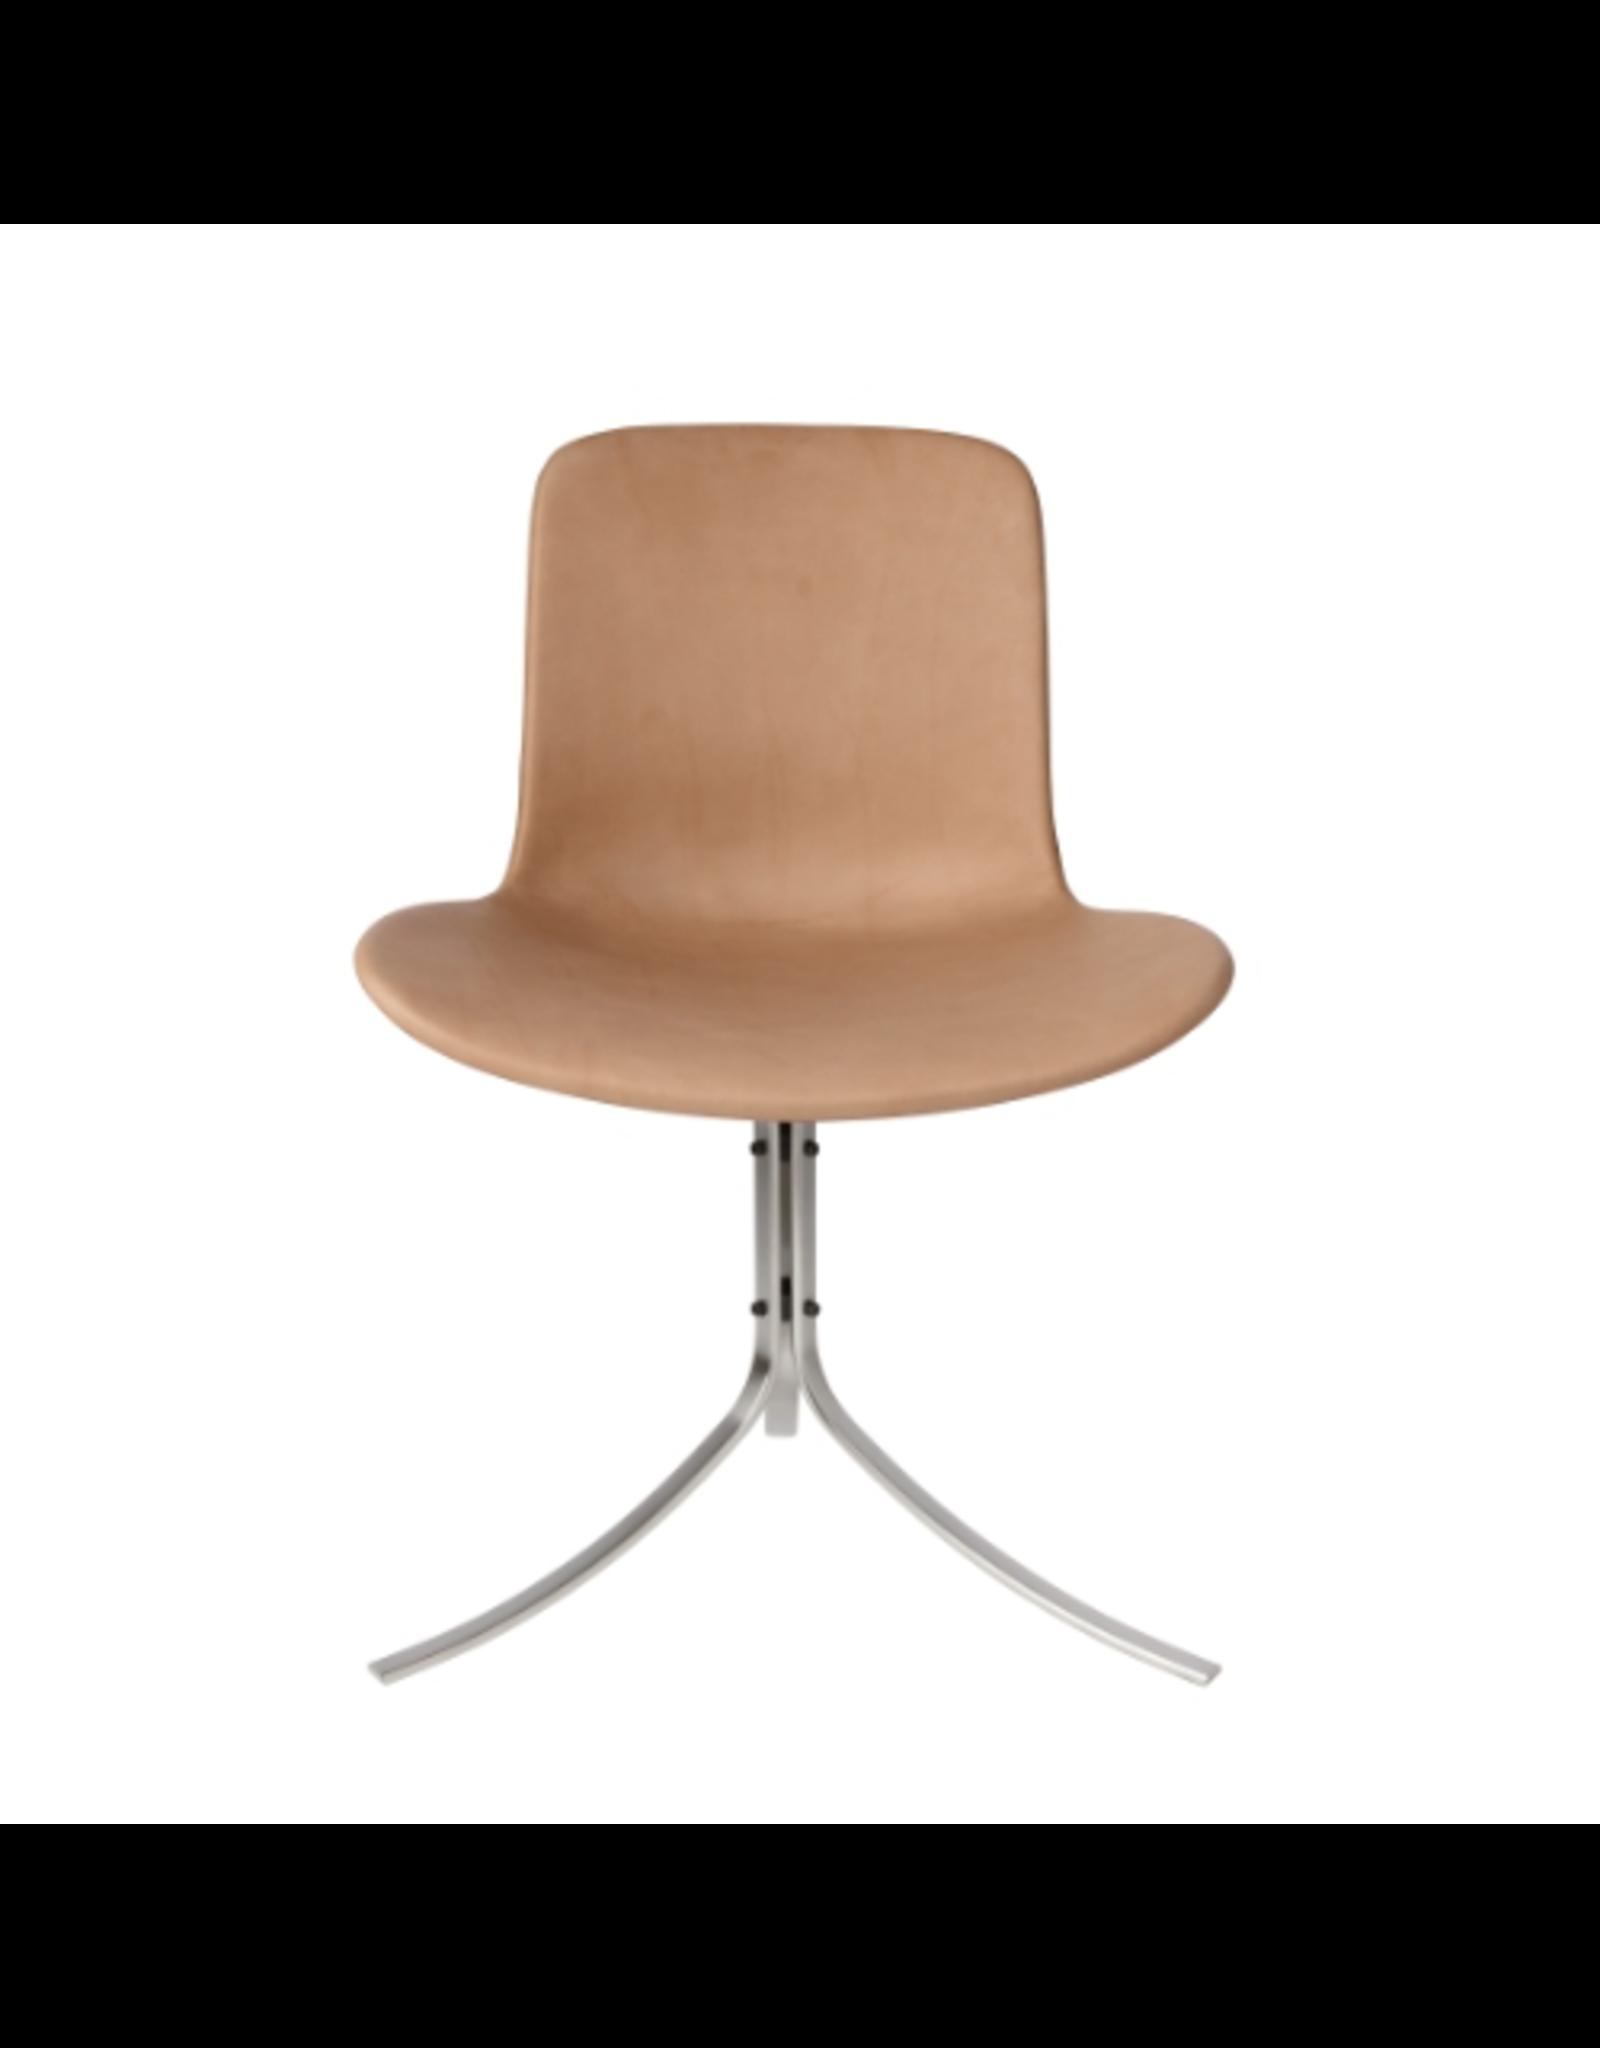 FRITZ HANSEN PK9 TULIP 鬱金香型椅子